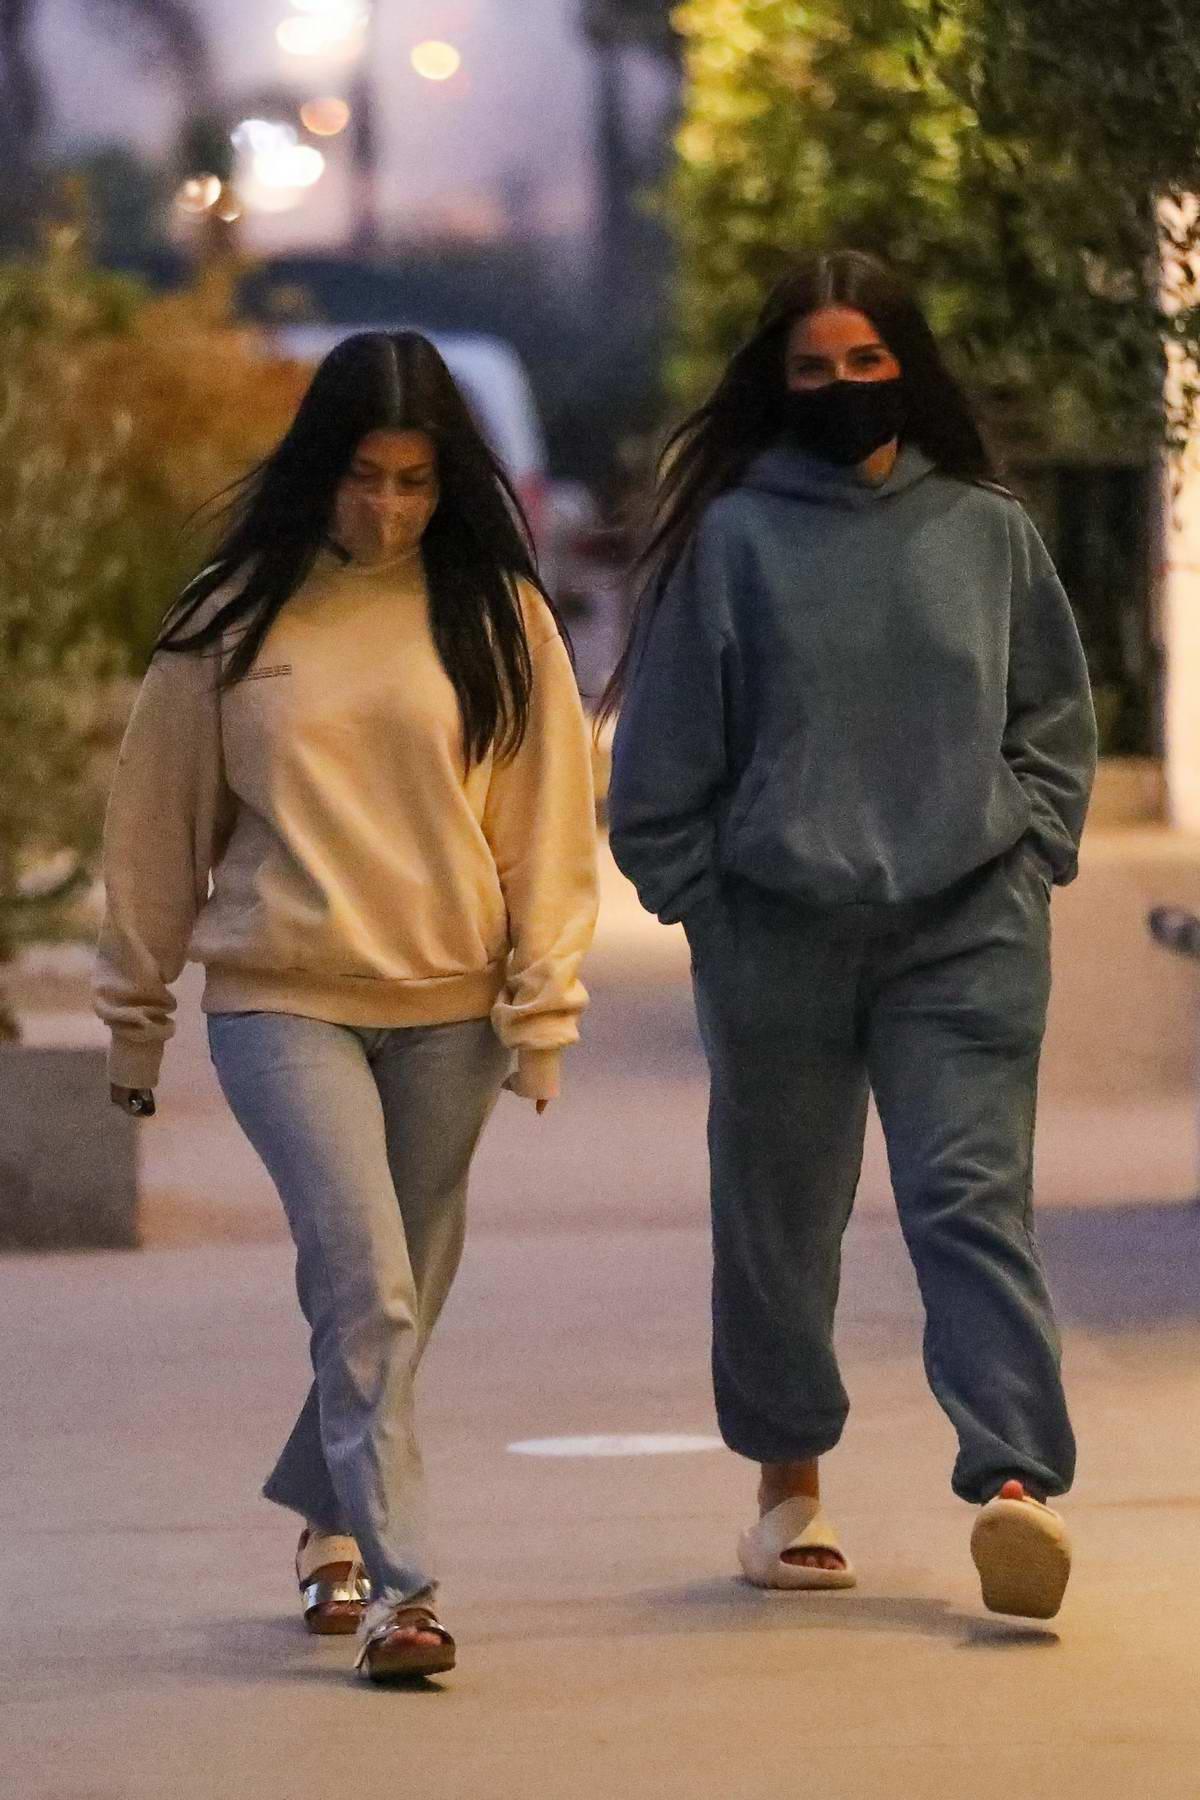 Addison Rae and Kourtney Kardashian are seen leaving dinner at Taverna Tony in Malibu, California